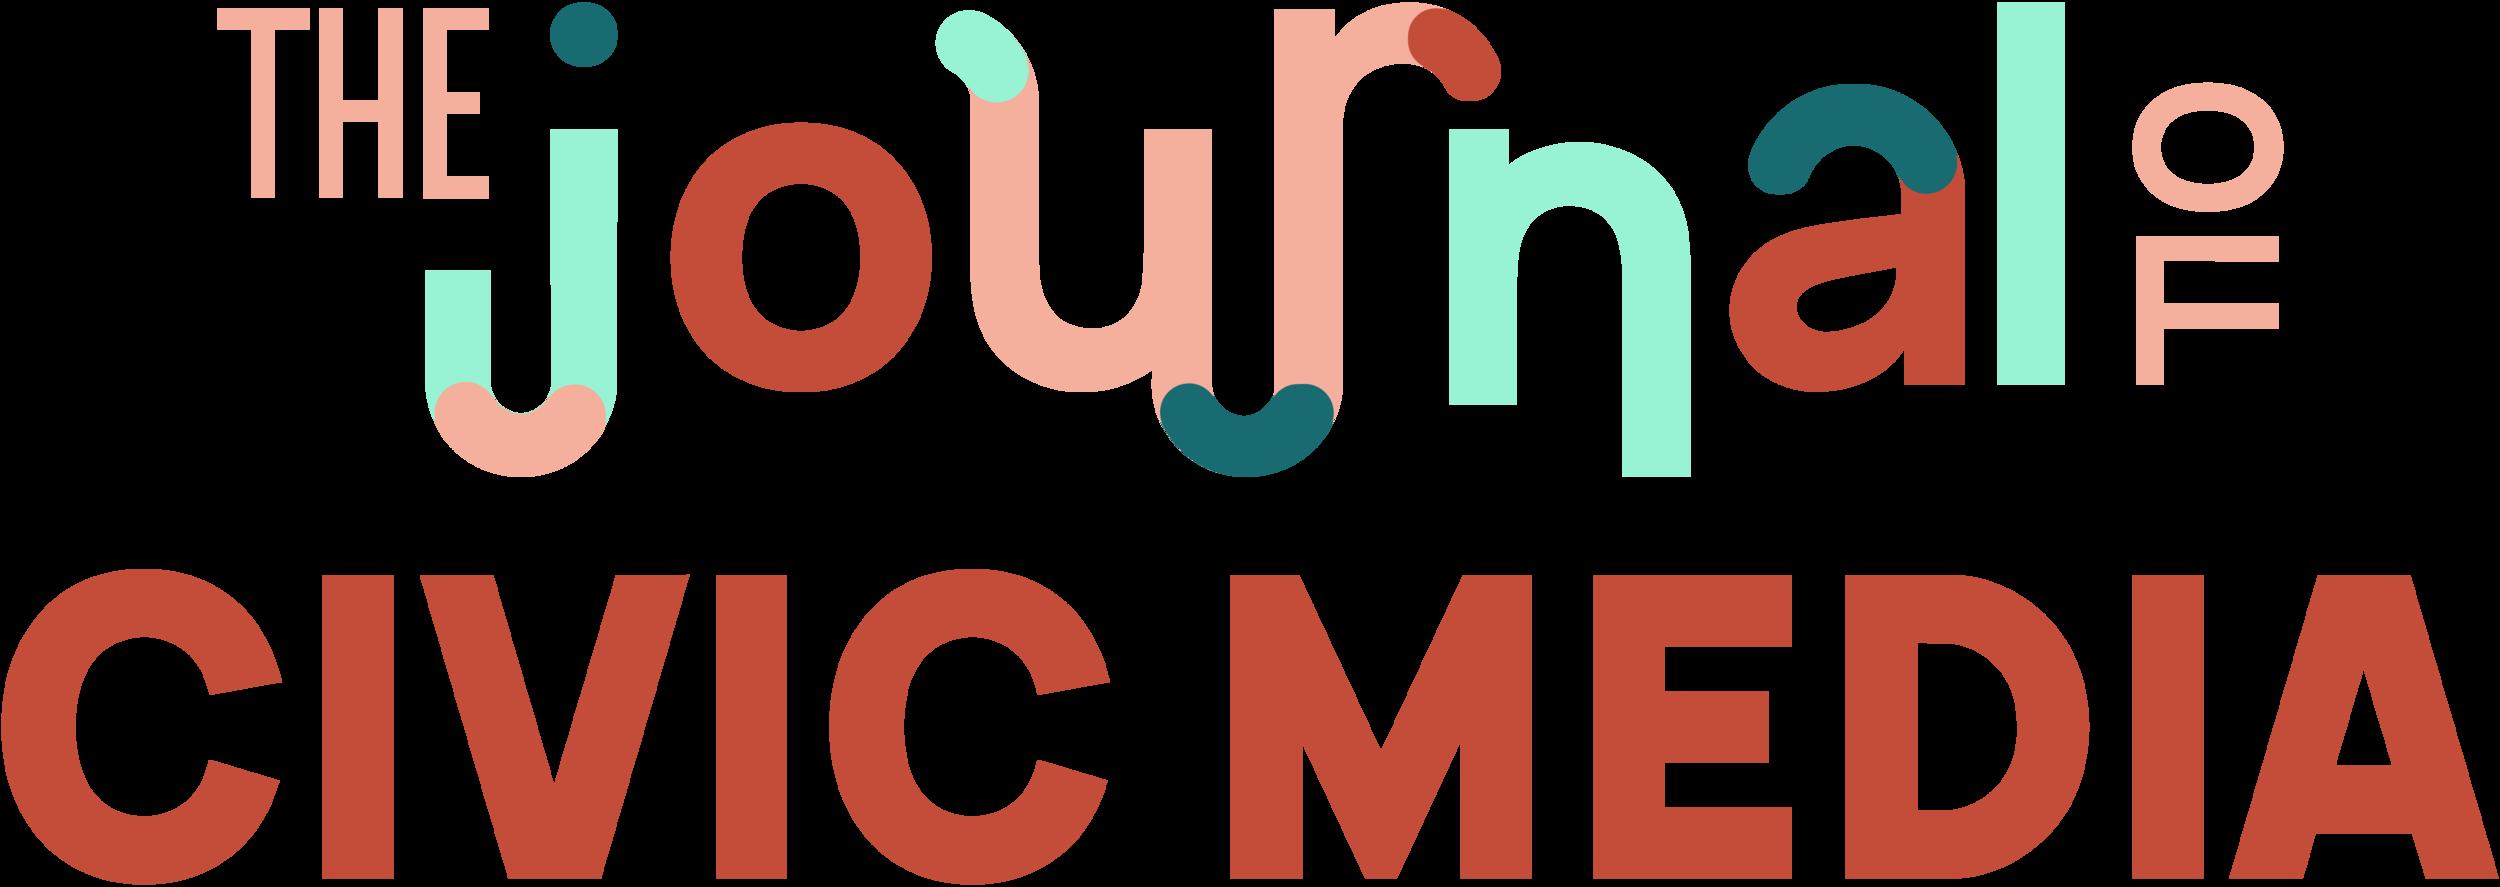 full size jcm logo.png